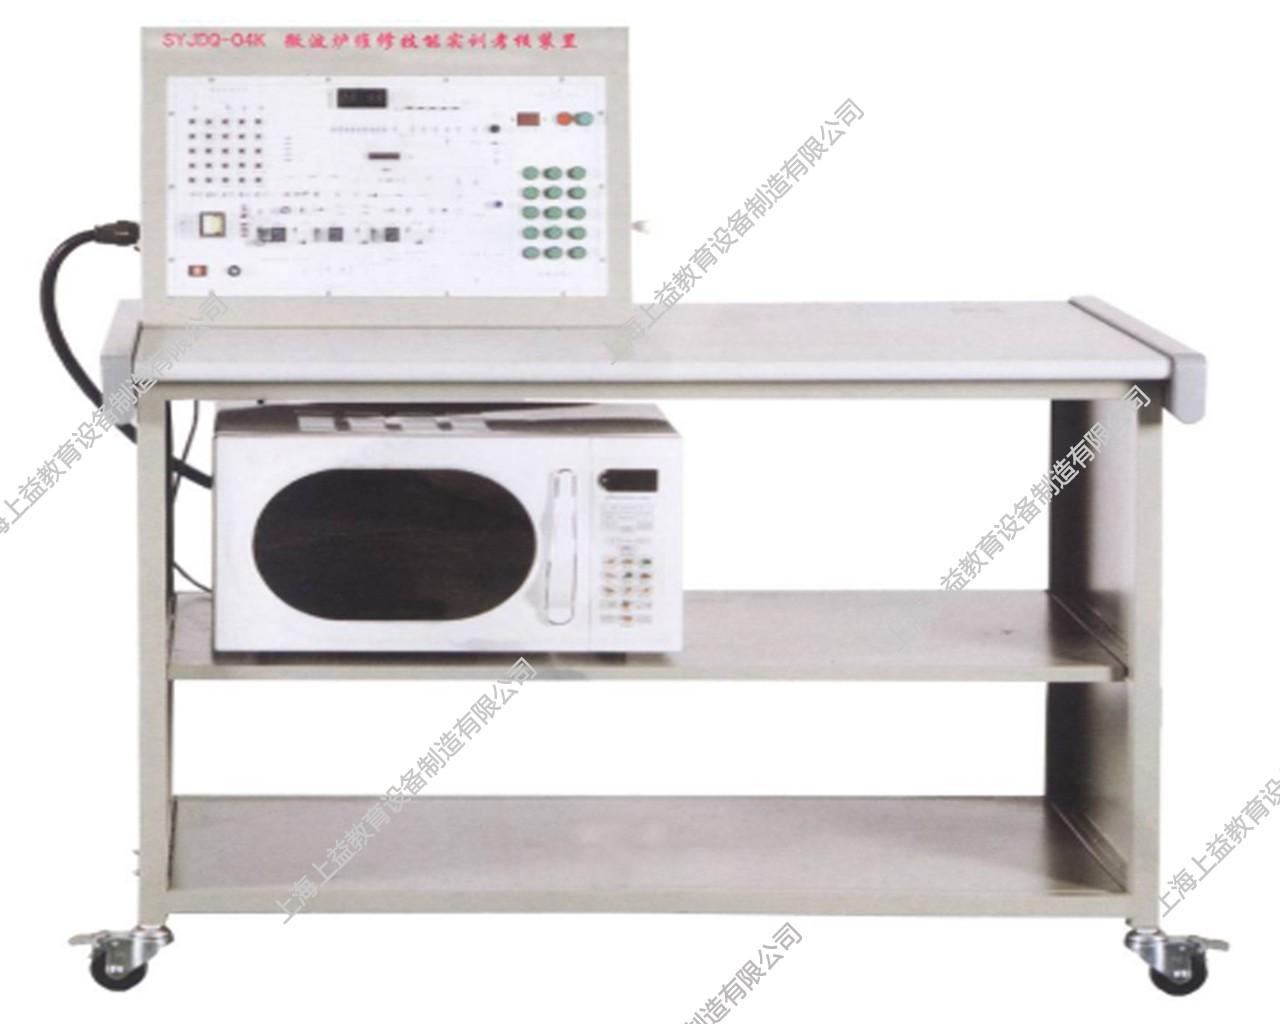 SYJDQ-04K微波炉维修技能wwwlehu8viplehu68vip装置